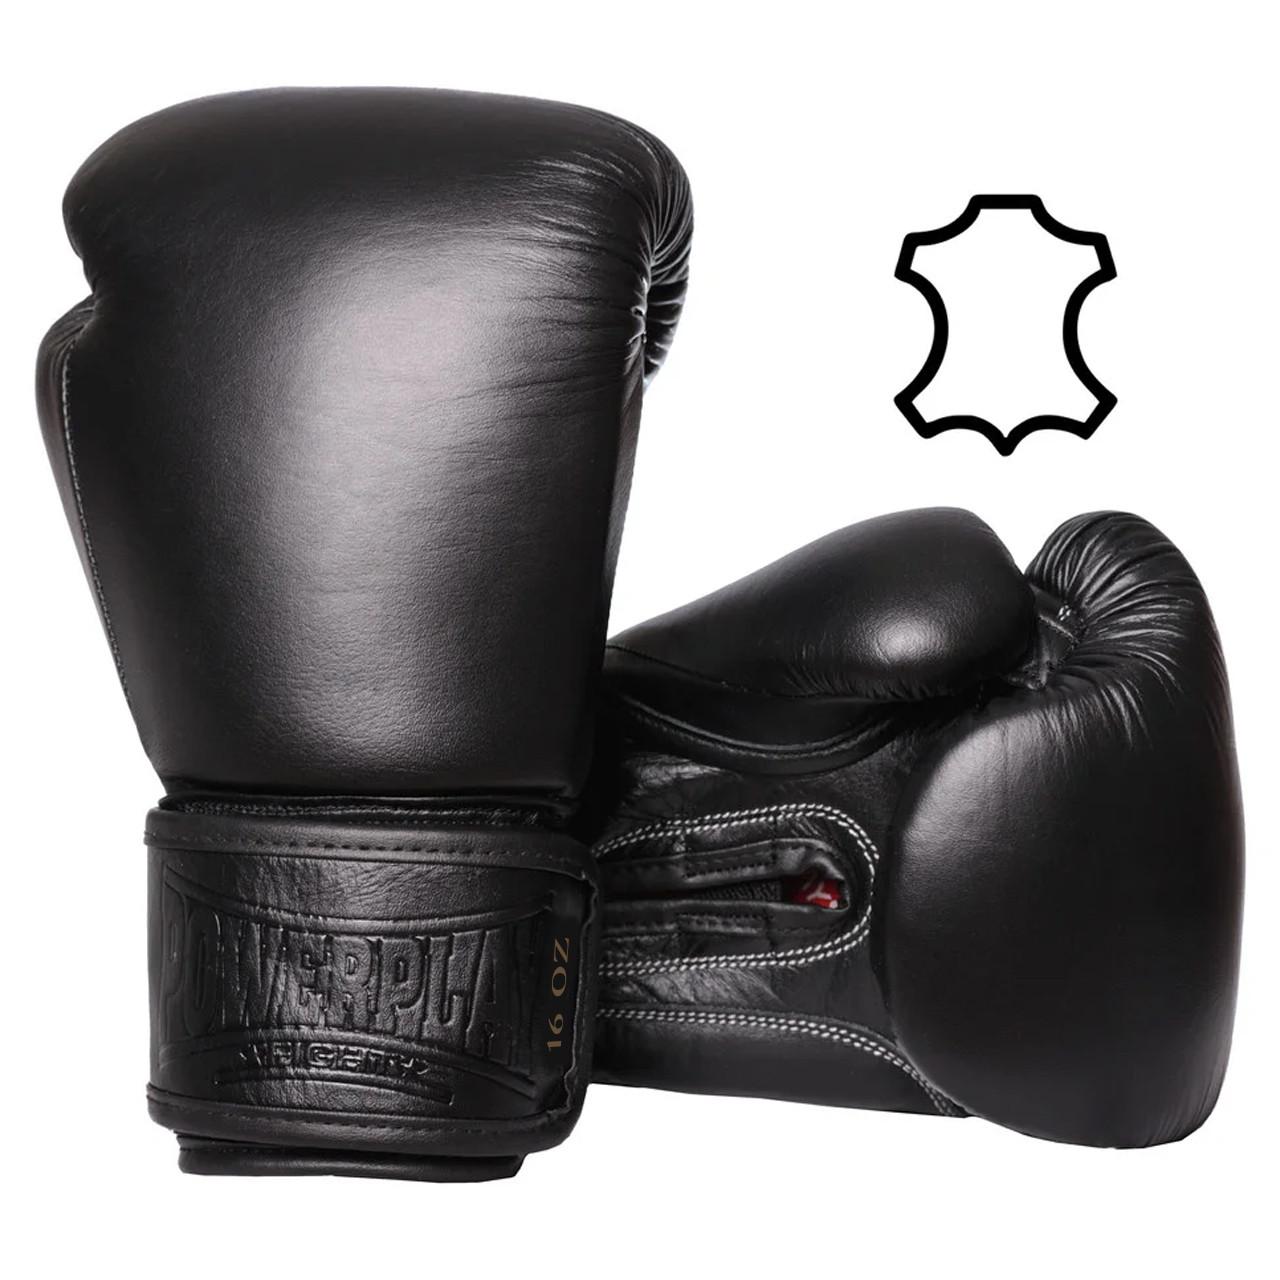 Боксерські рукавиці PowerPlay 3014 Чорні [натуральна шкіра] 16 унцій